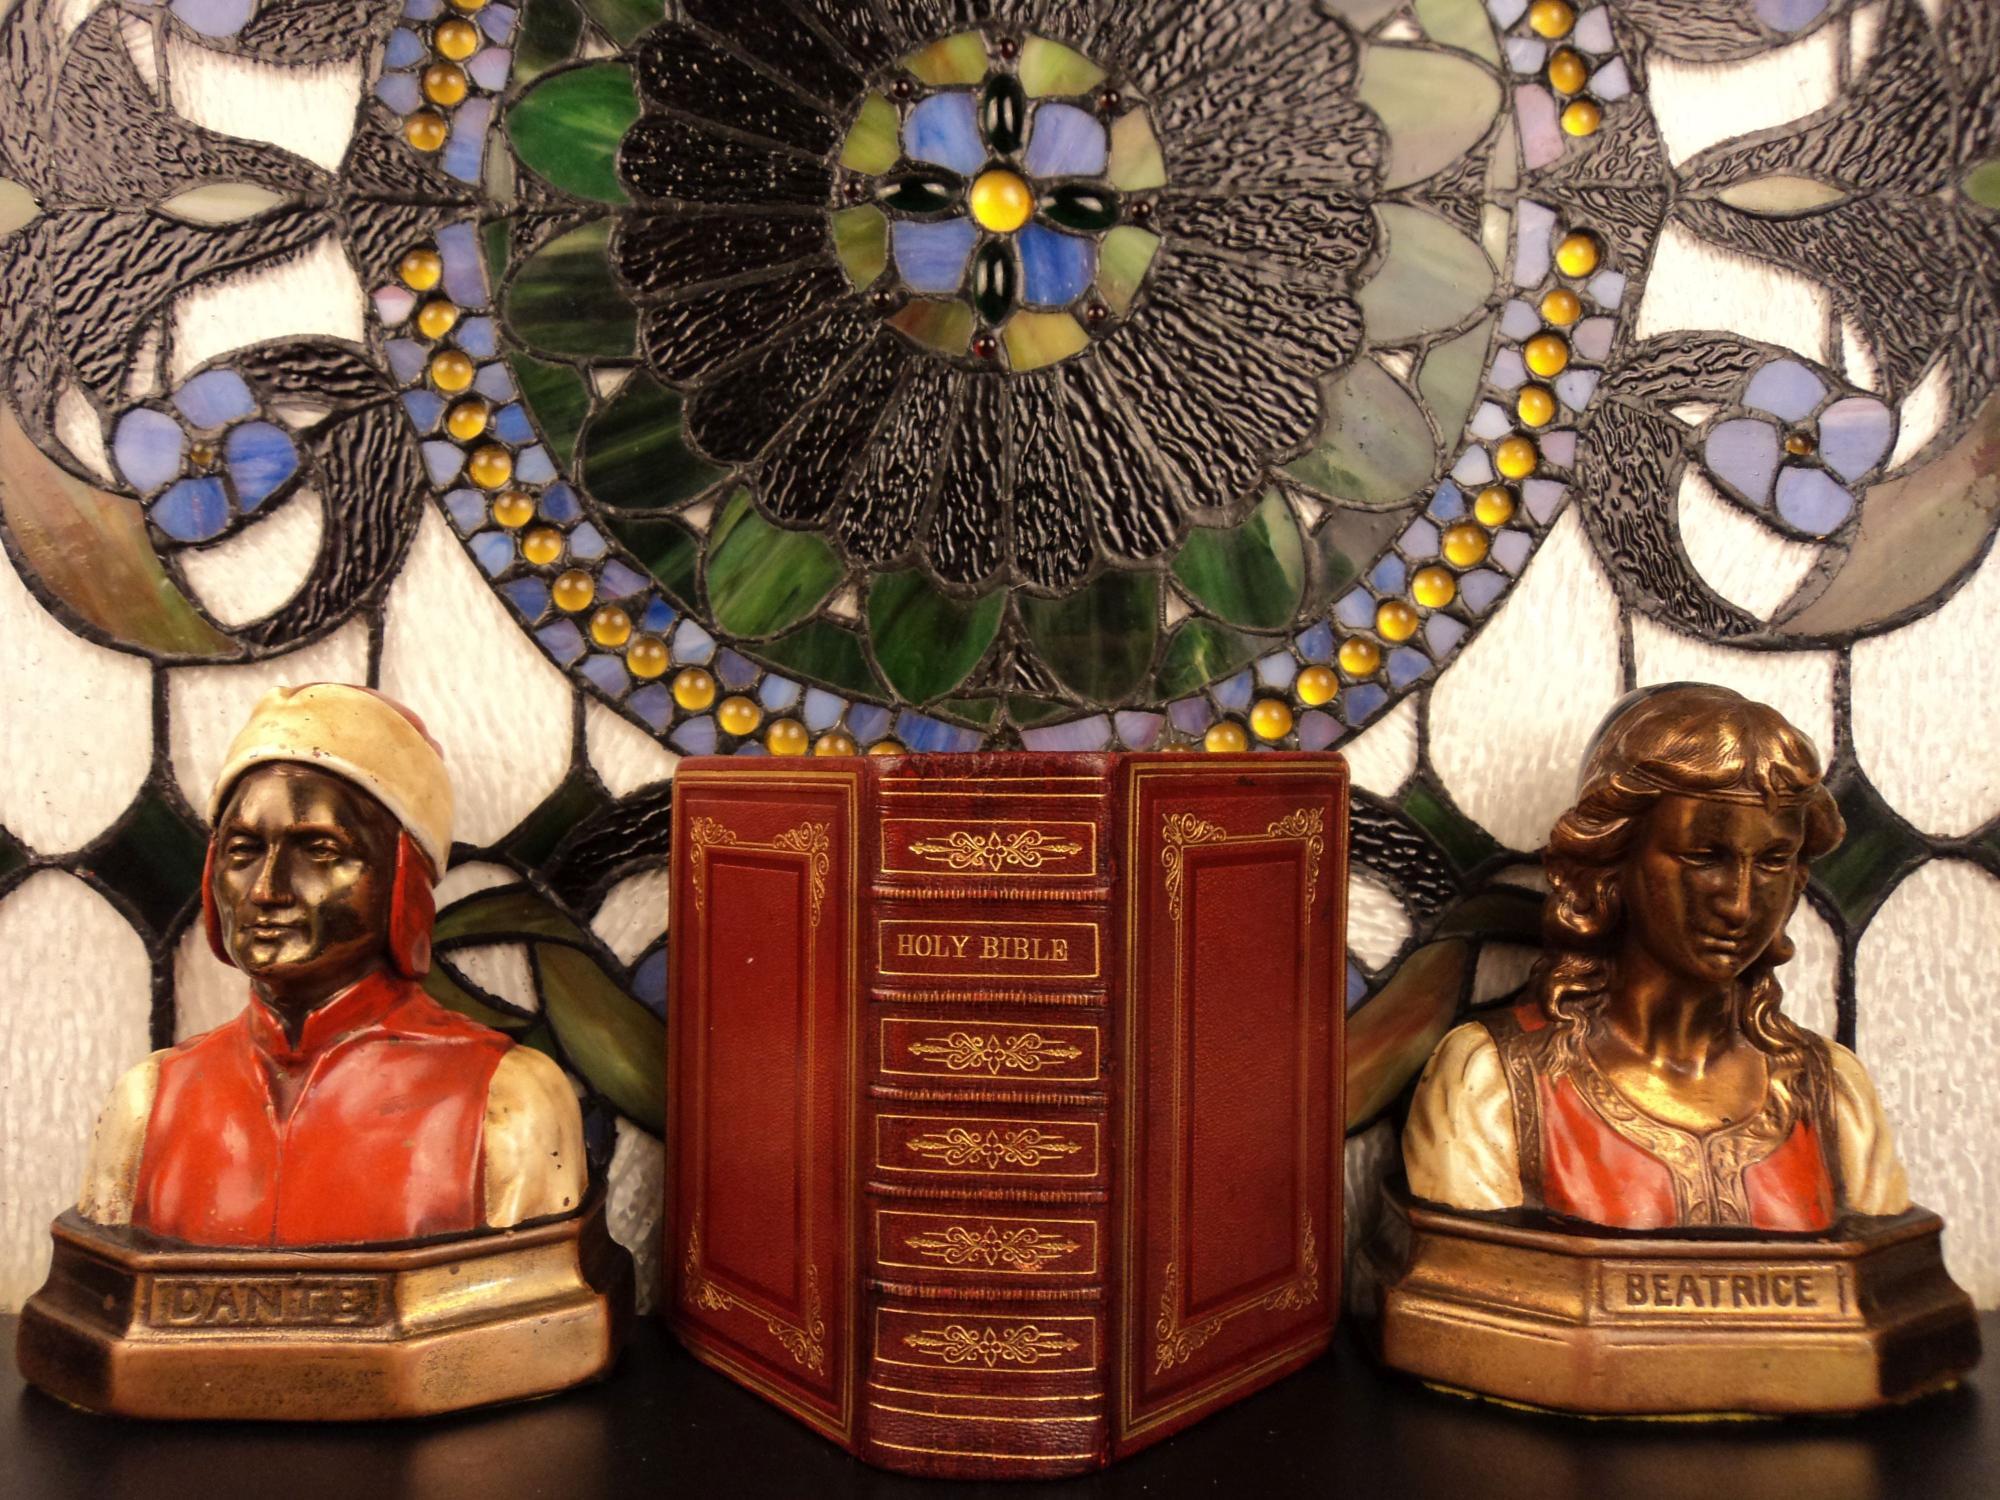 1868 HOLY BIBLE Moroccan Leather English King James KJV Beautiful BINDING NY: Holy Bible